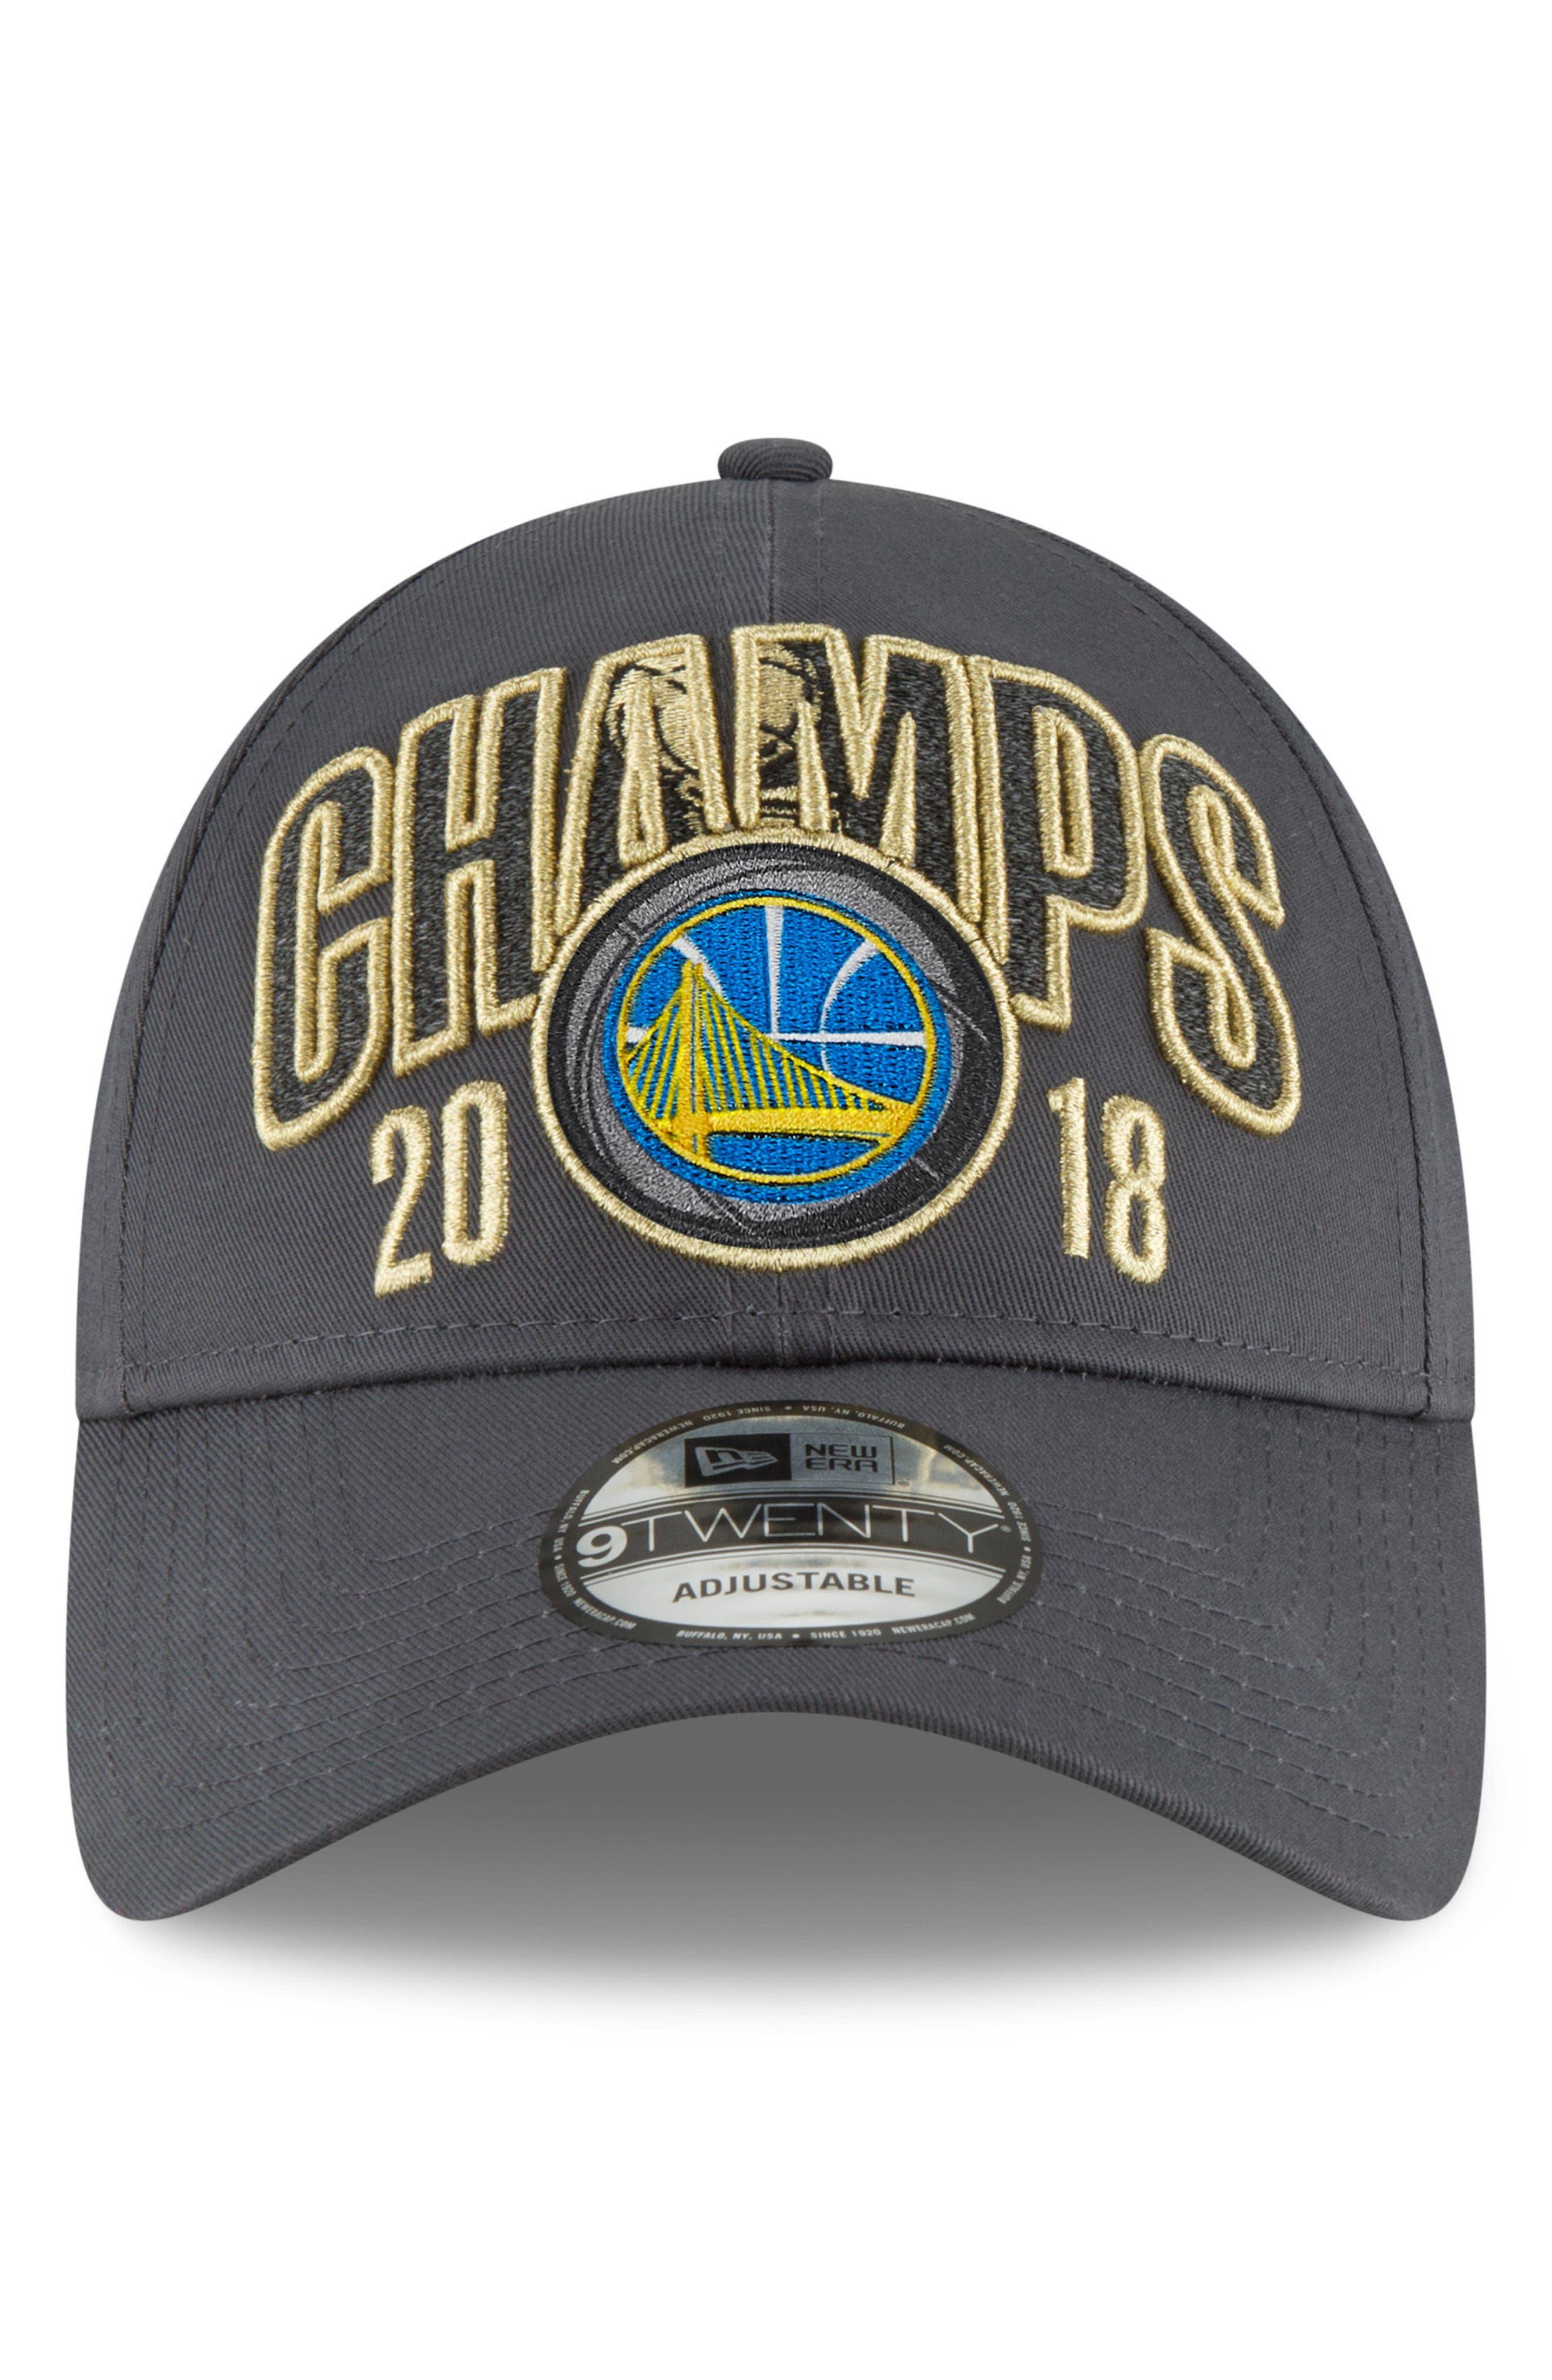 2018 NBA Champions - Golden State Warriors 9Twenty Baseball Cap,                         Main,                         color, GOLDEN STATE WARRIORS